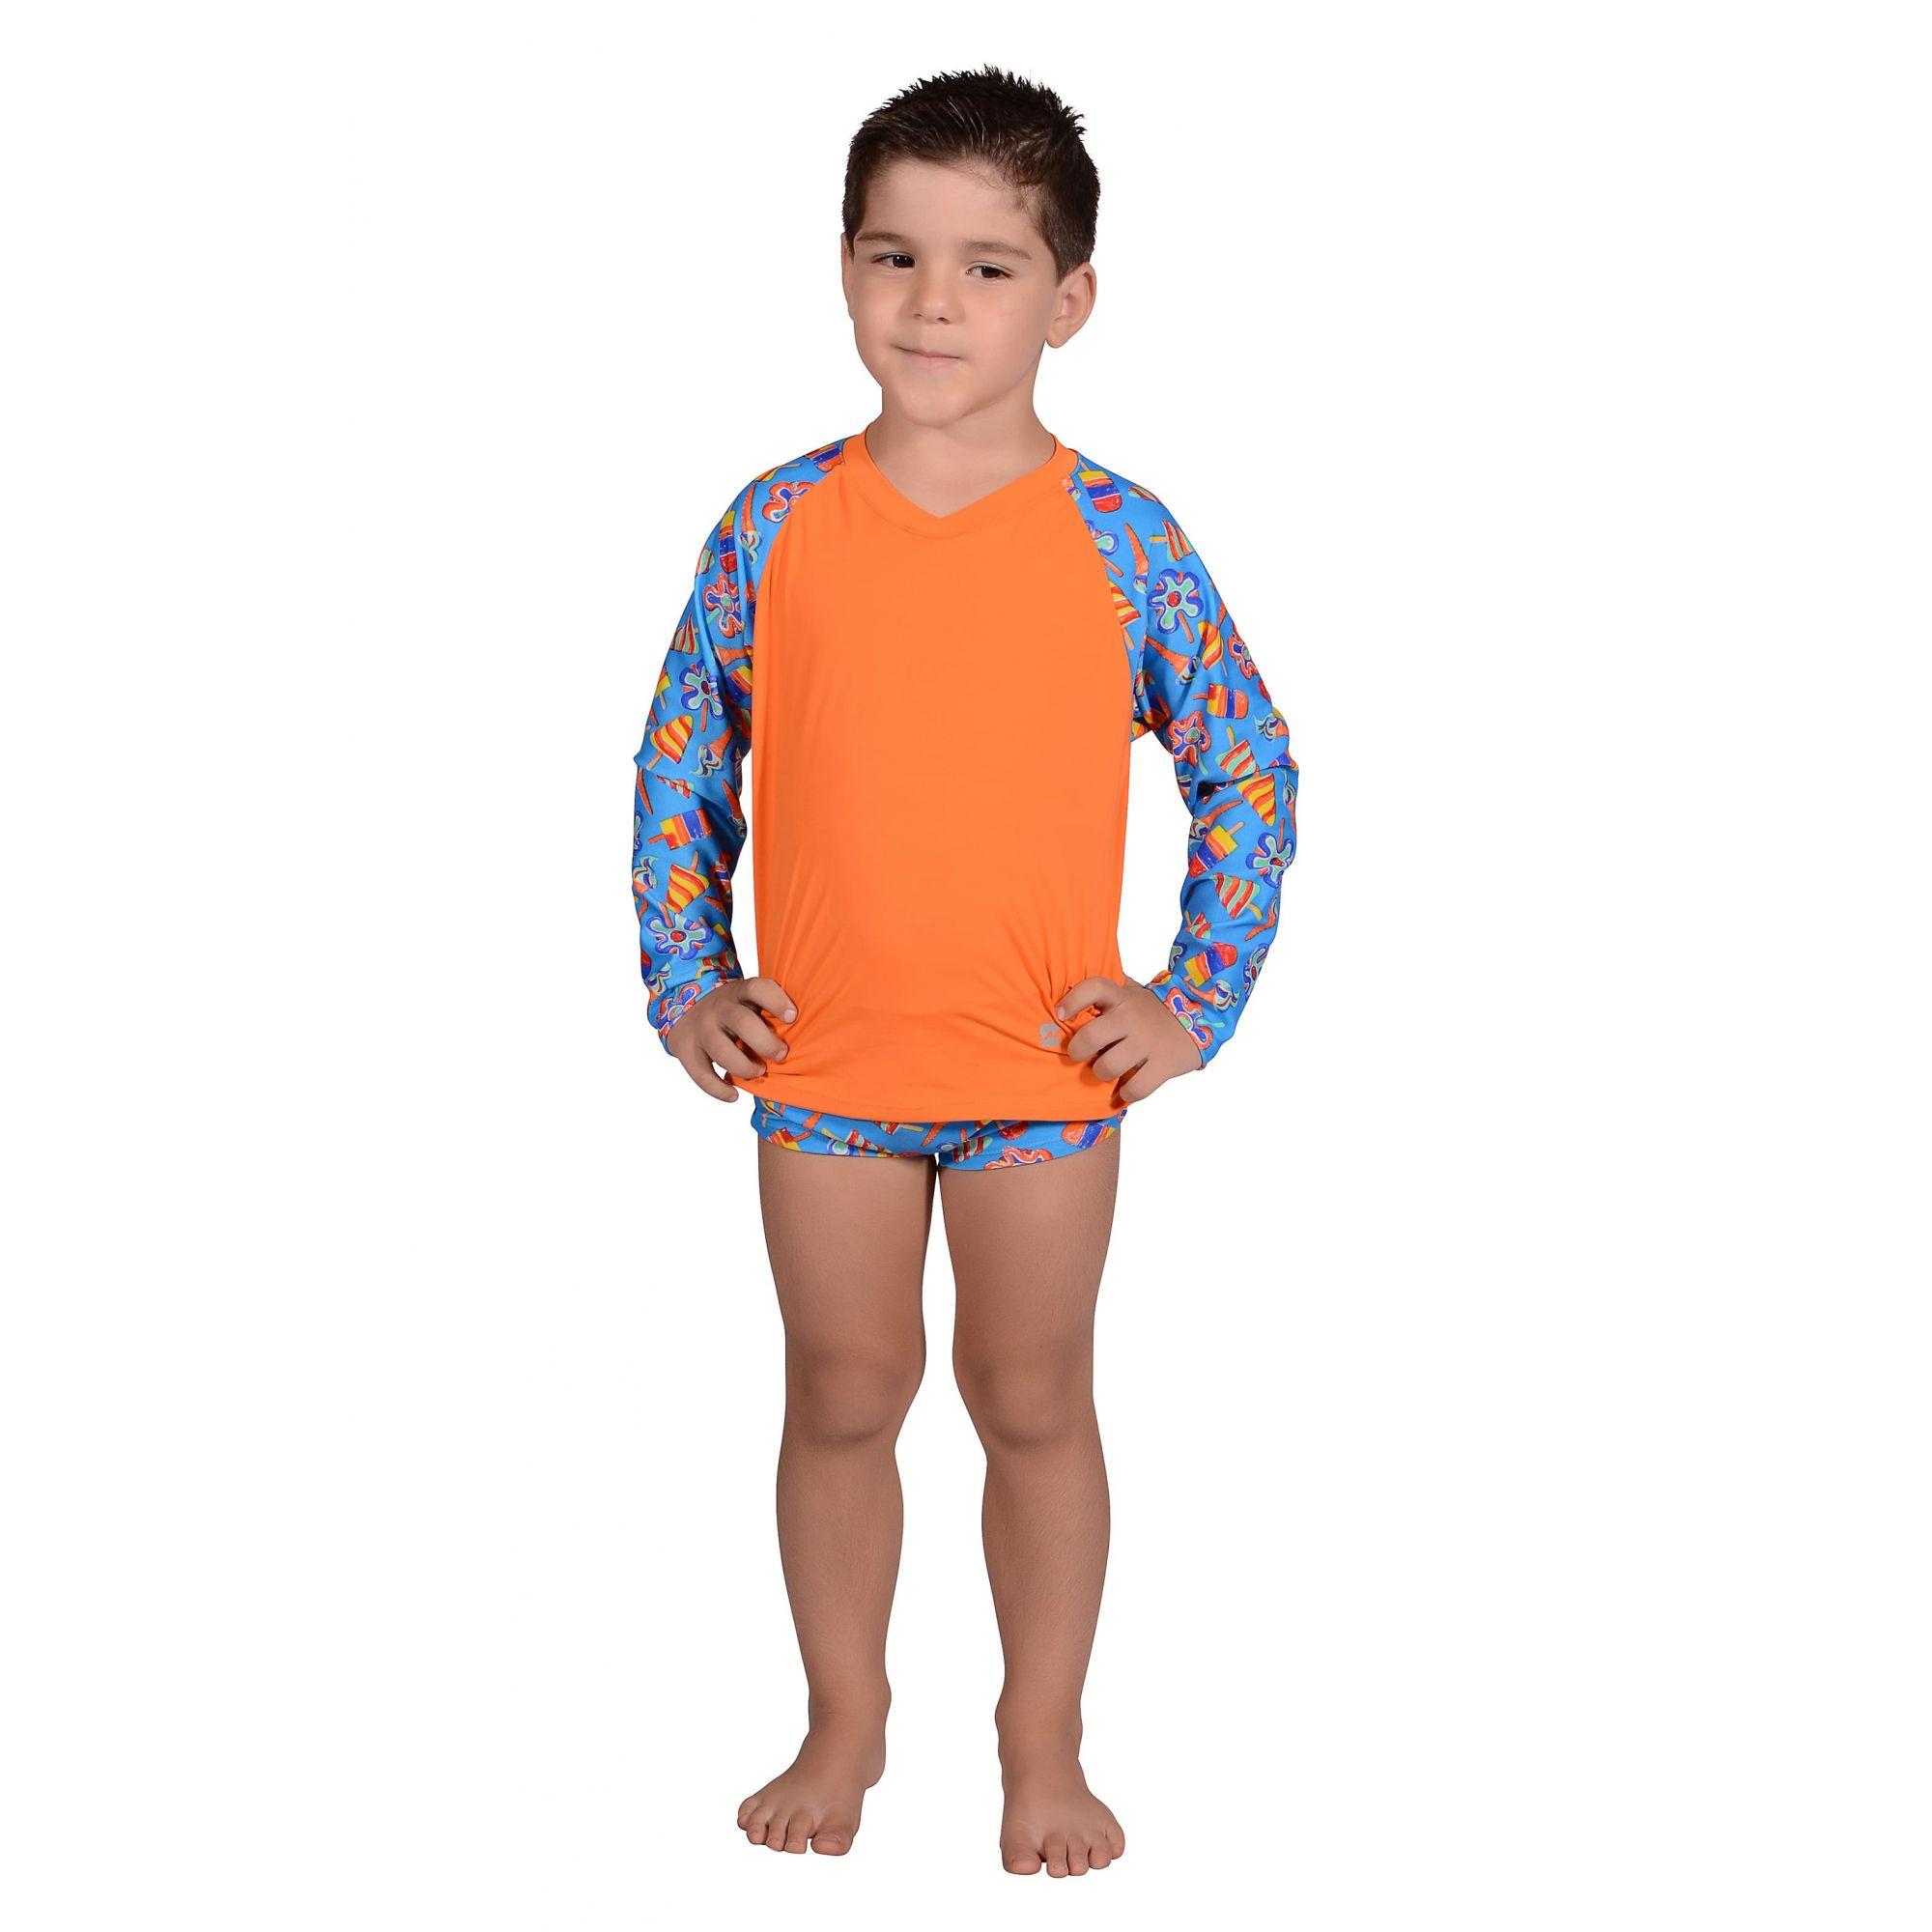 Camiseta Infantil Manga Longa UV 50+ Sorvete Azul